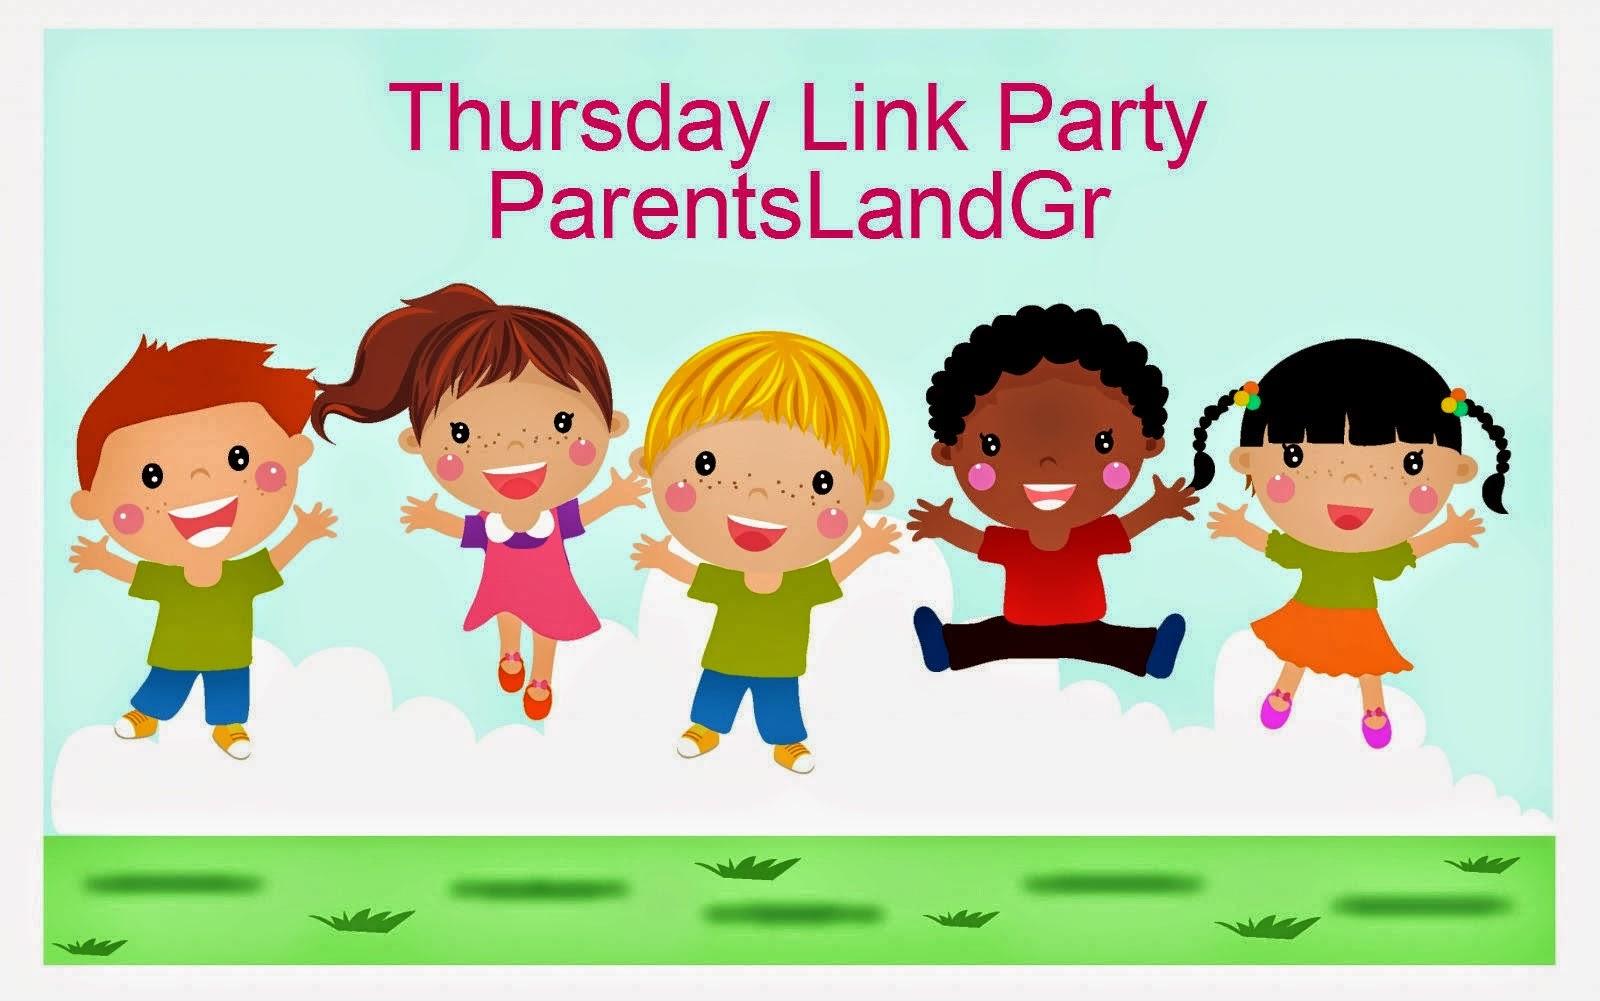 http://parentsland-gr.blogspot.gr/search/label/Link%20Party